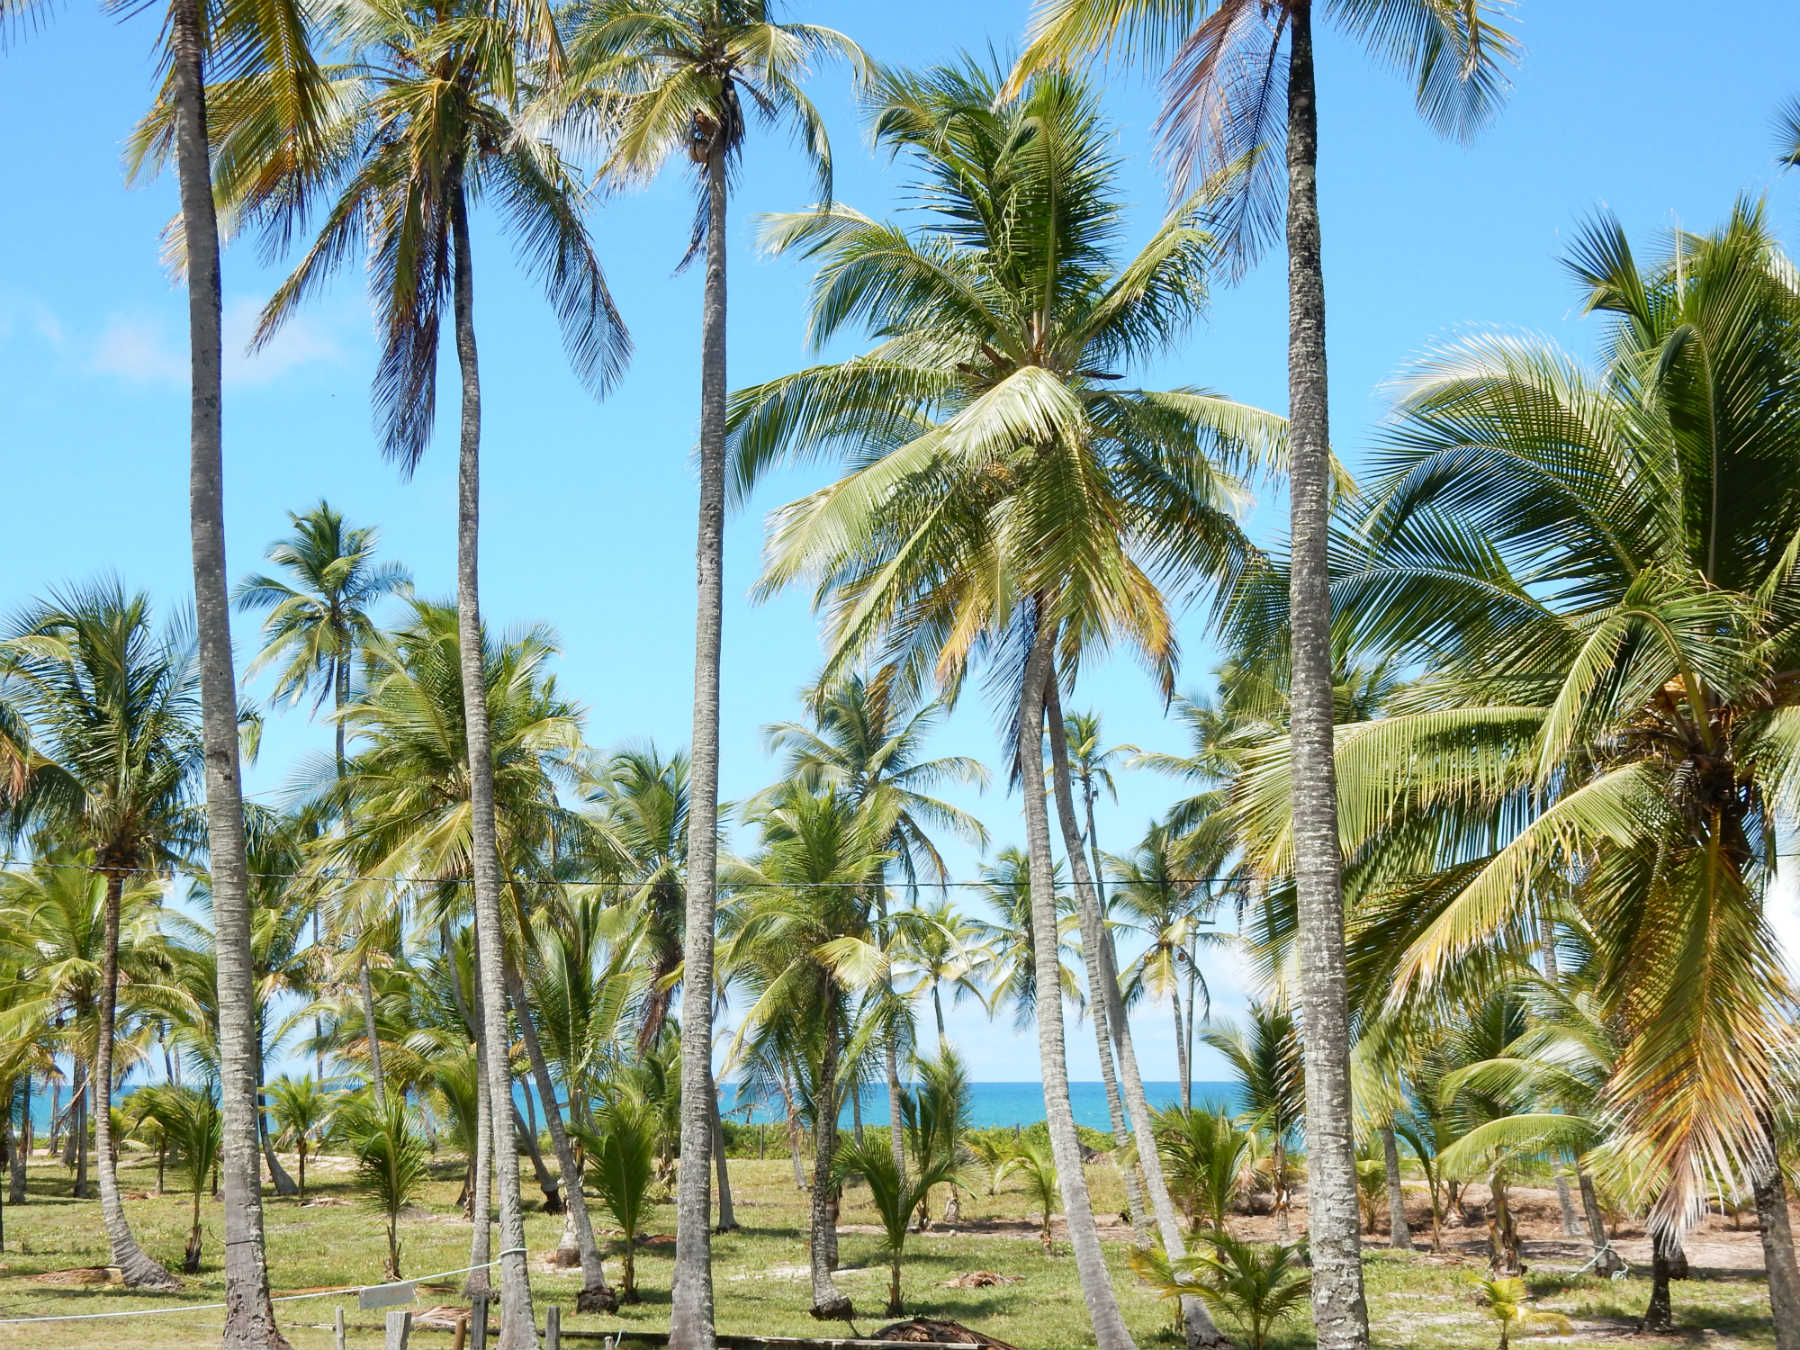 praia cassange barra grande bahia